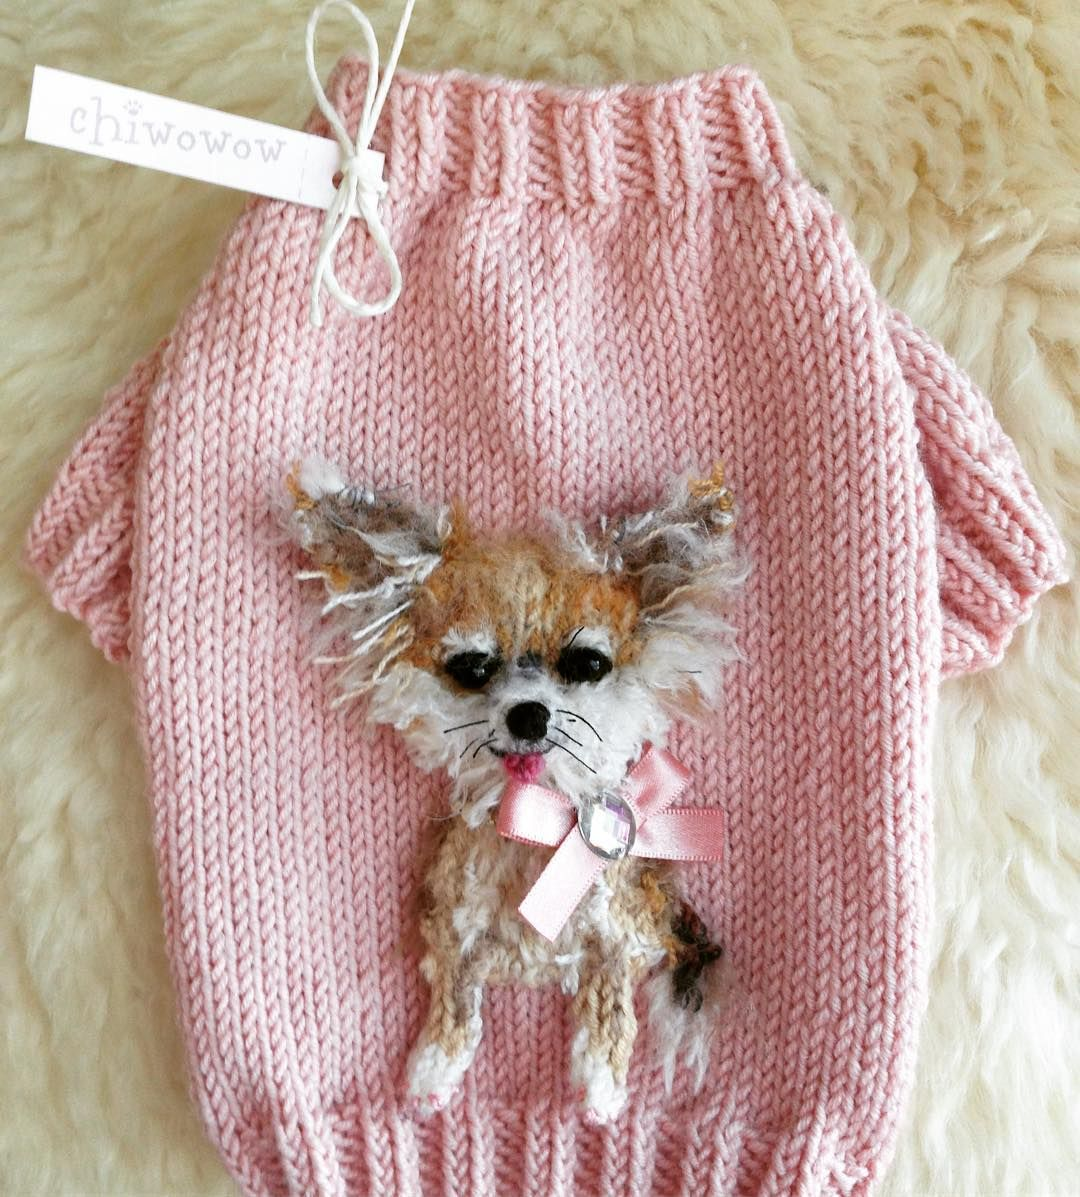 My Chihuahua Selfie Sweater #pink #chihuahua #handmade #selfie ...